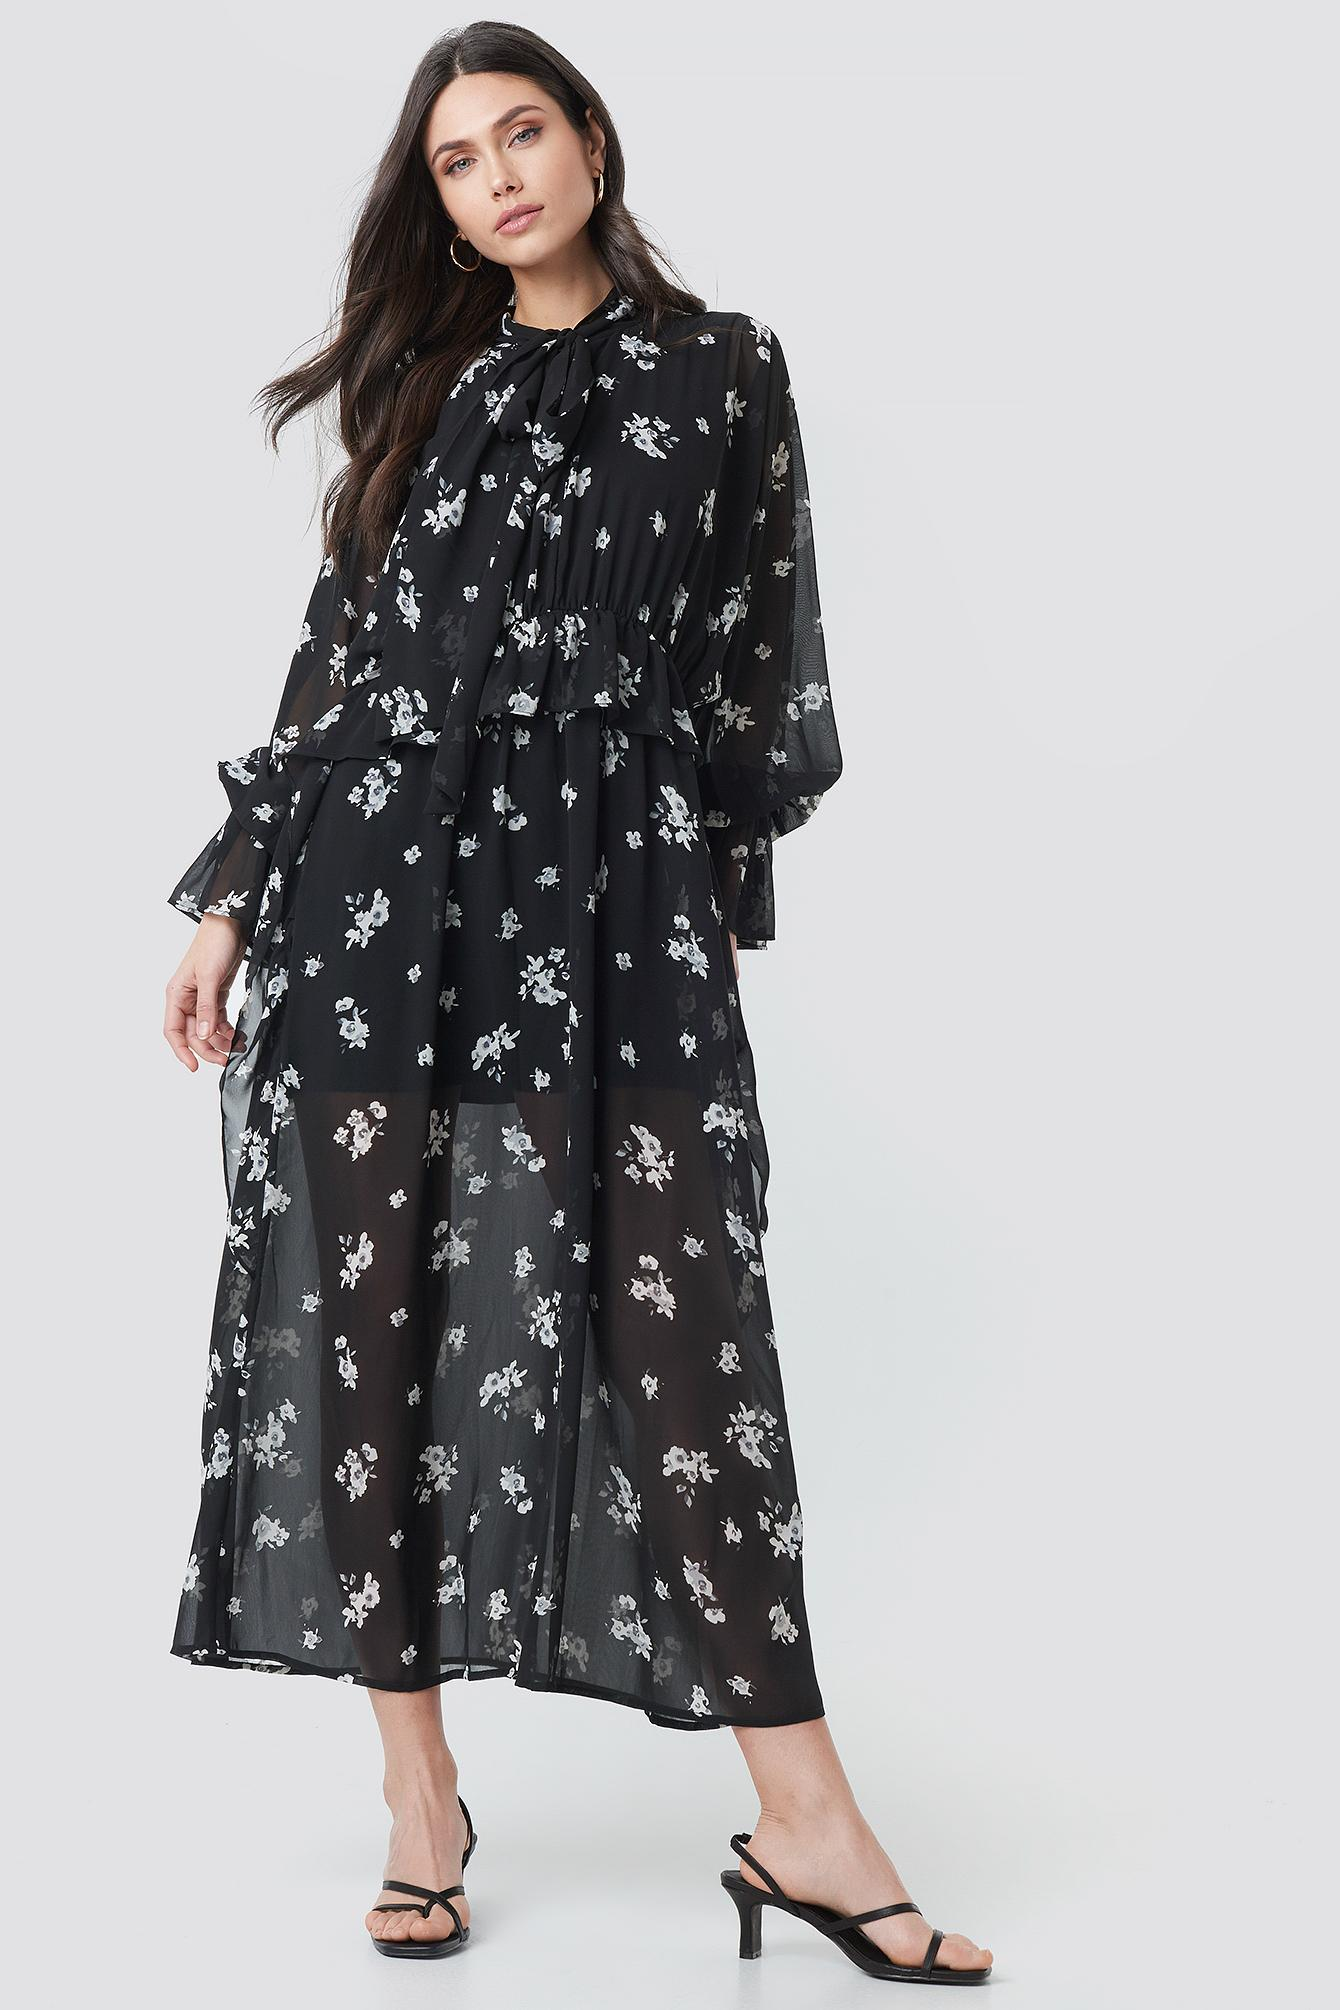 a5f213c065 Lyst - NA-KD Tie Collar Printed Maxi Dress Black/white Flower Print ...